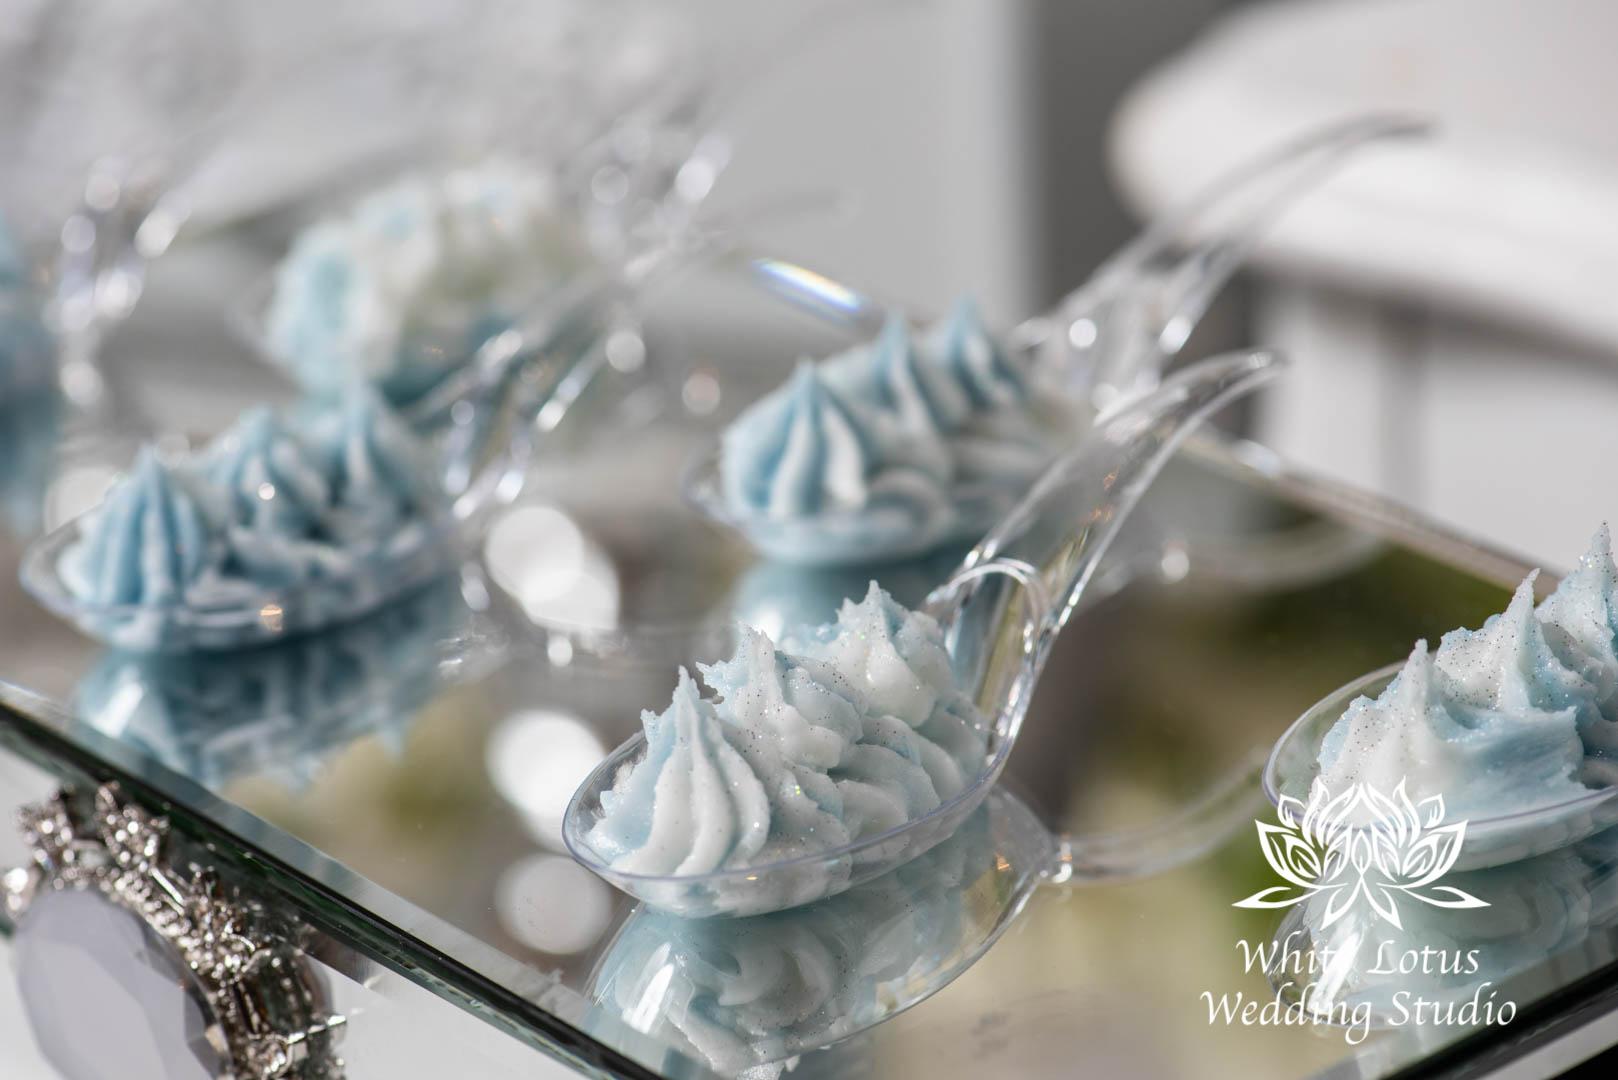 099- GLAM WINTERLUXE WEDDING INSPIRATION